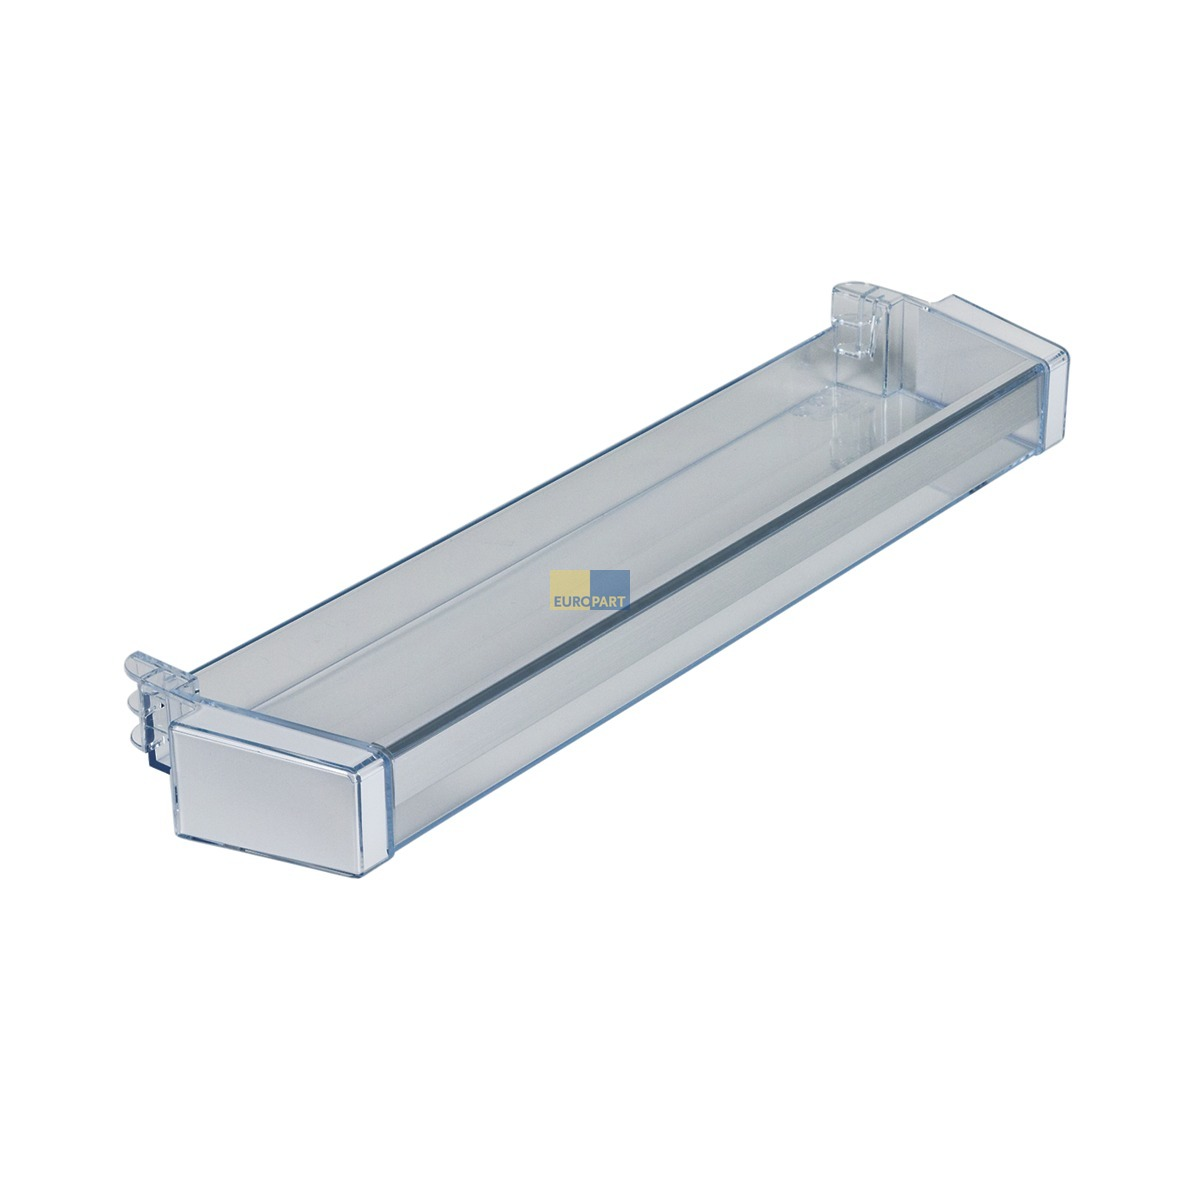 Abstellfach Absteller 40mm hoch BOSCH 00743238 OT! - ABEA Hausgeräte ...